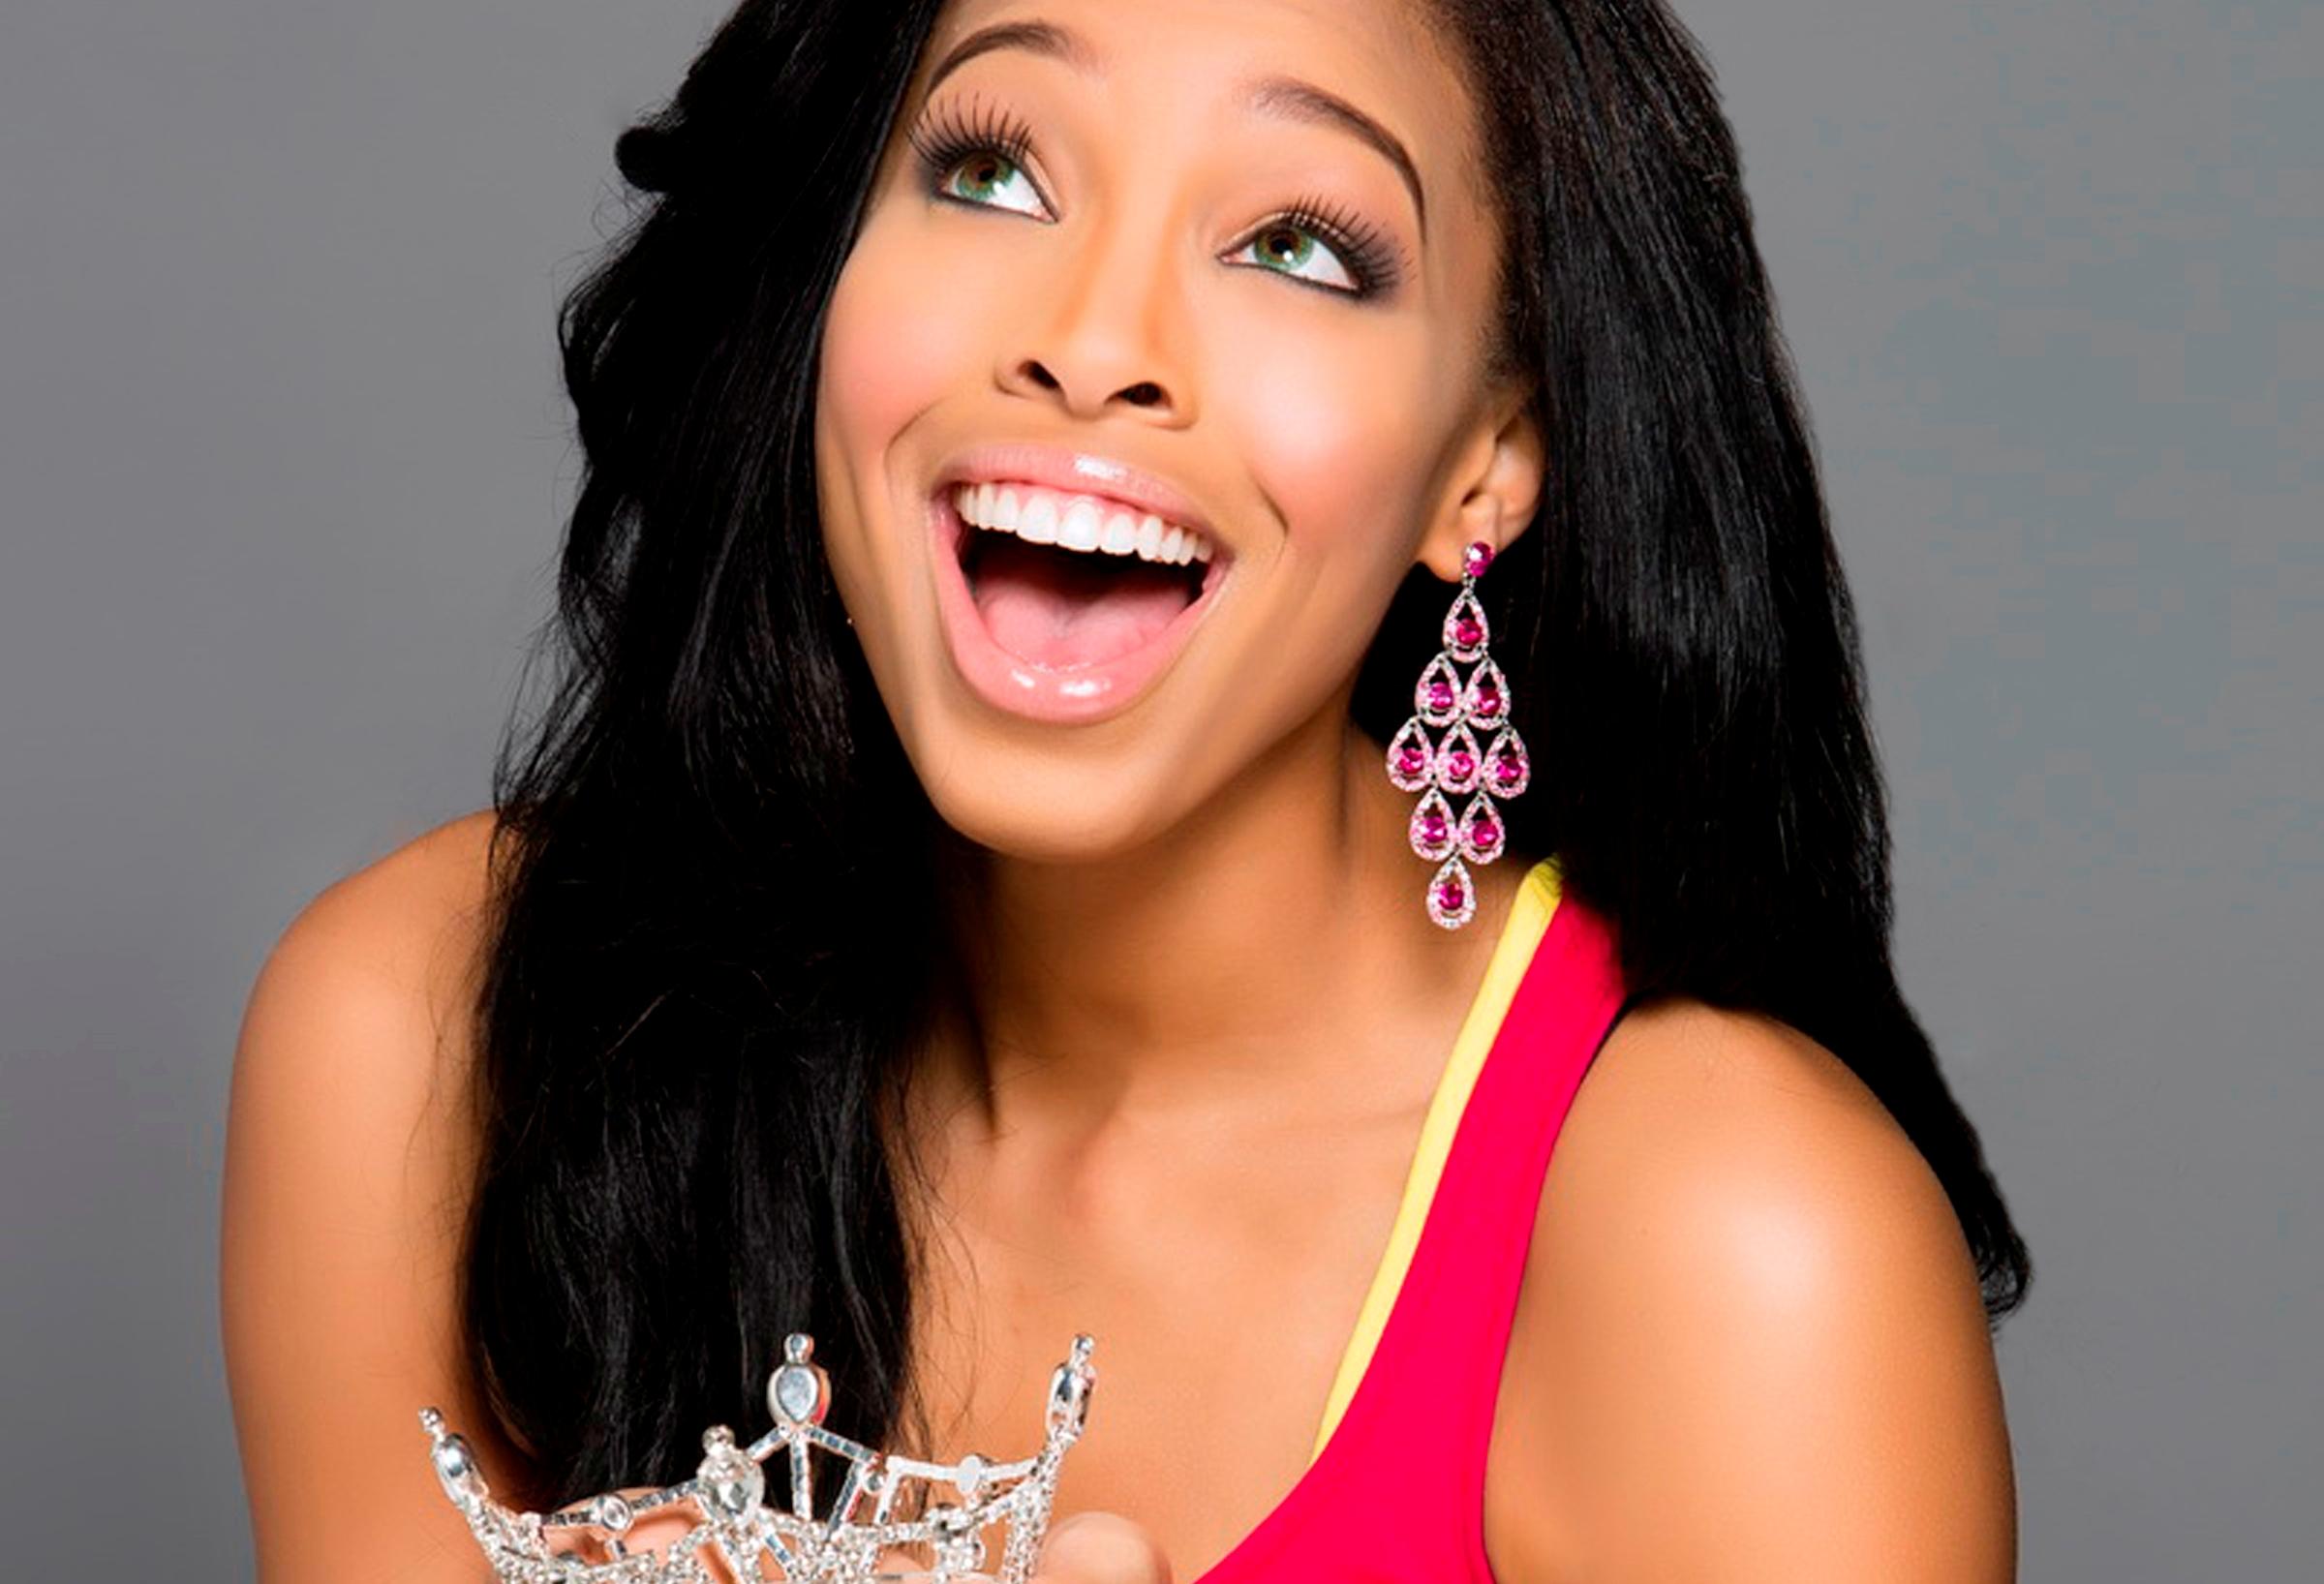 Rockwall-Heath teen vies for Miss Texas title